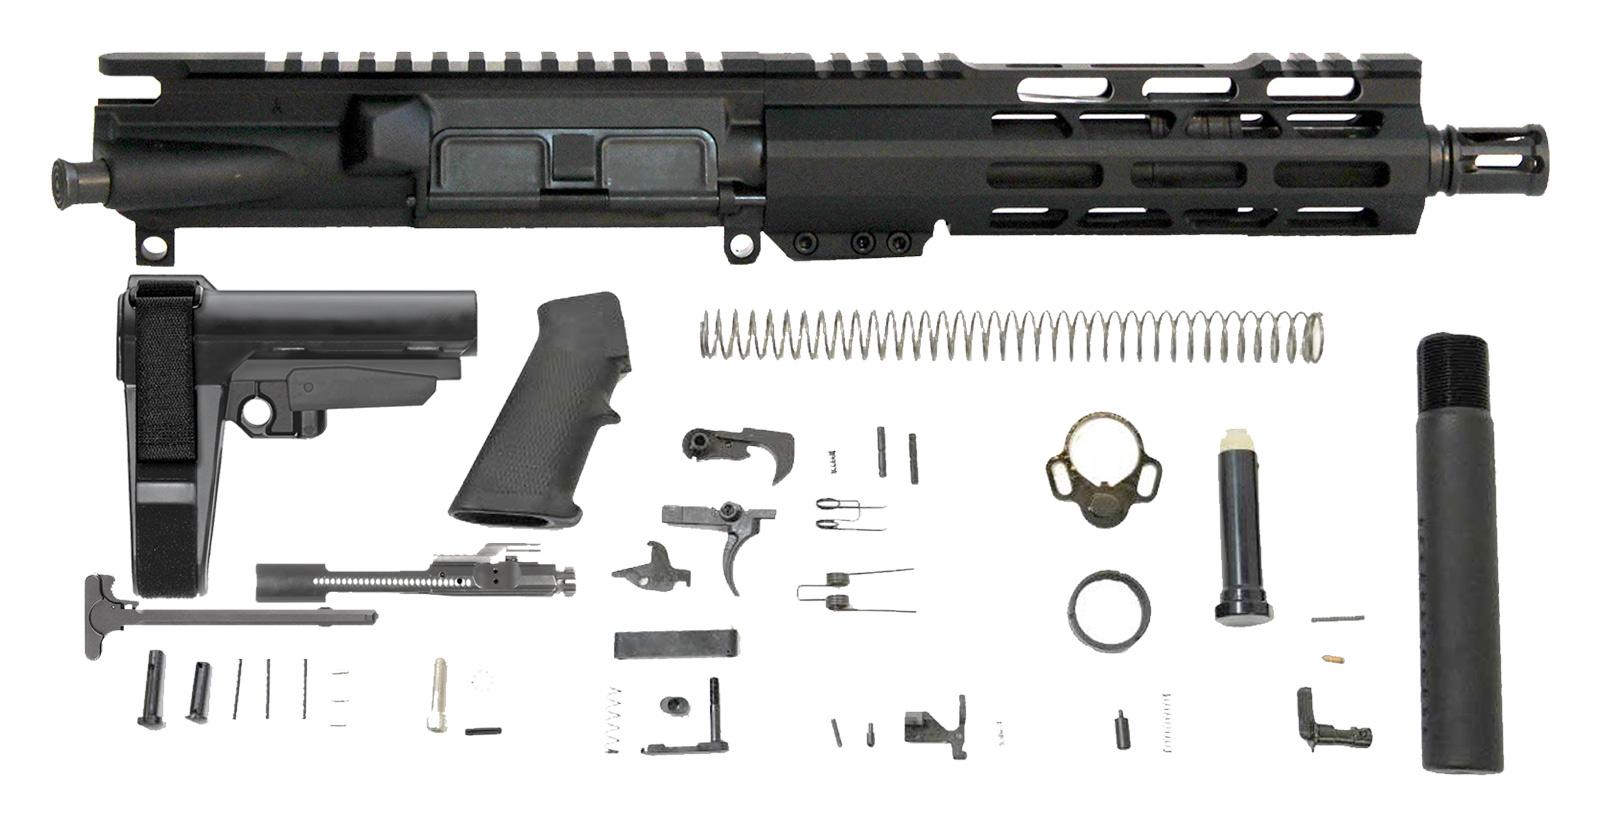 ar15-pistol-kit-7-5-inch-7-62x39-m-lok-sba3-205509